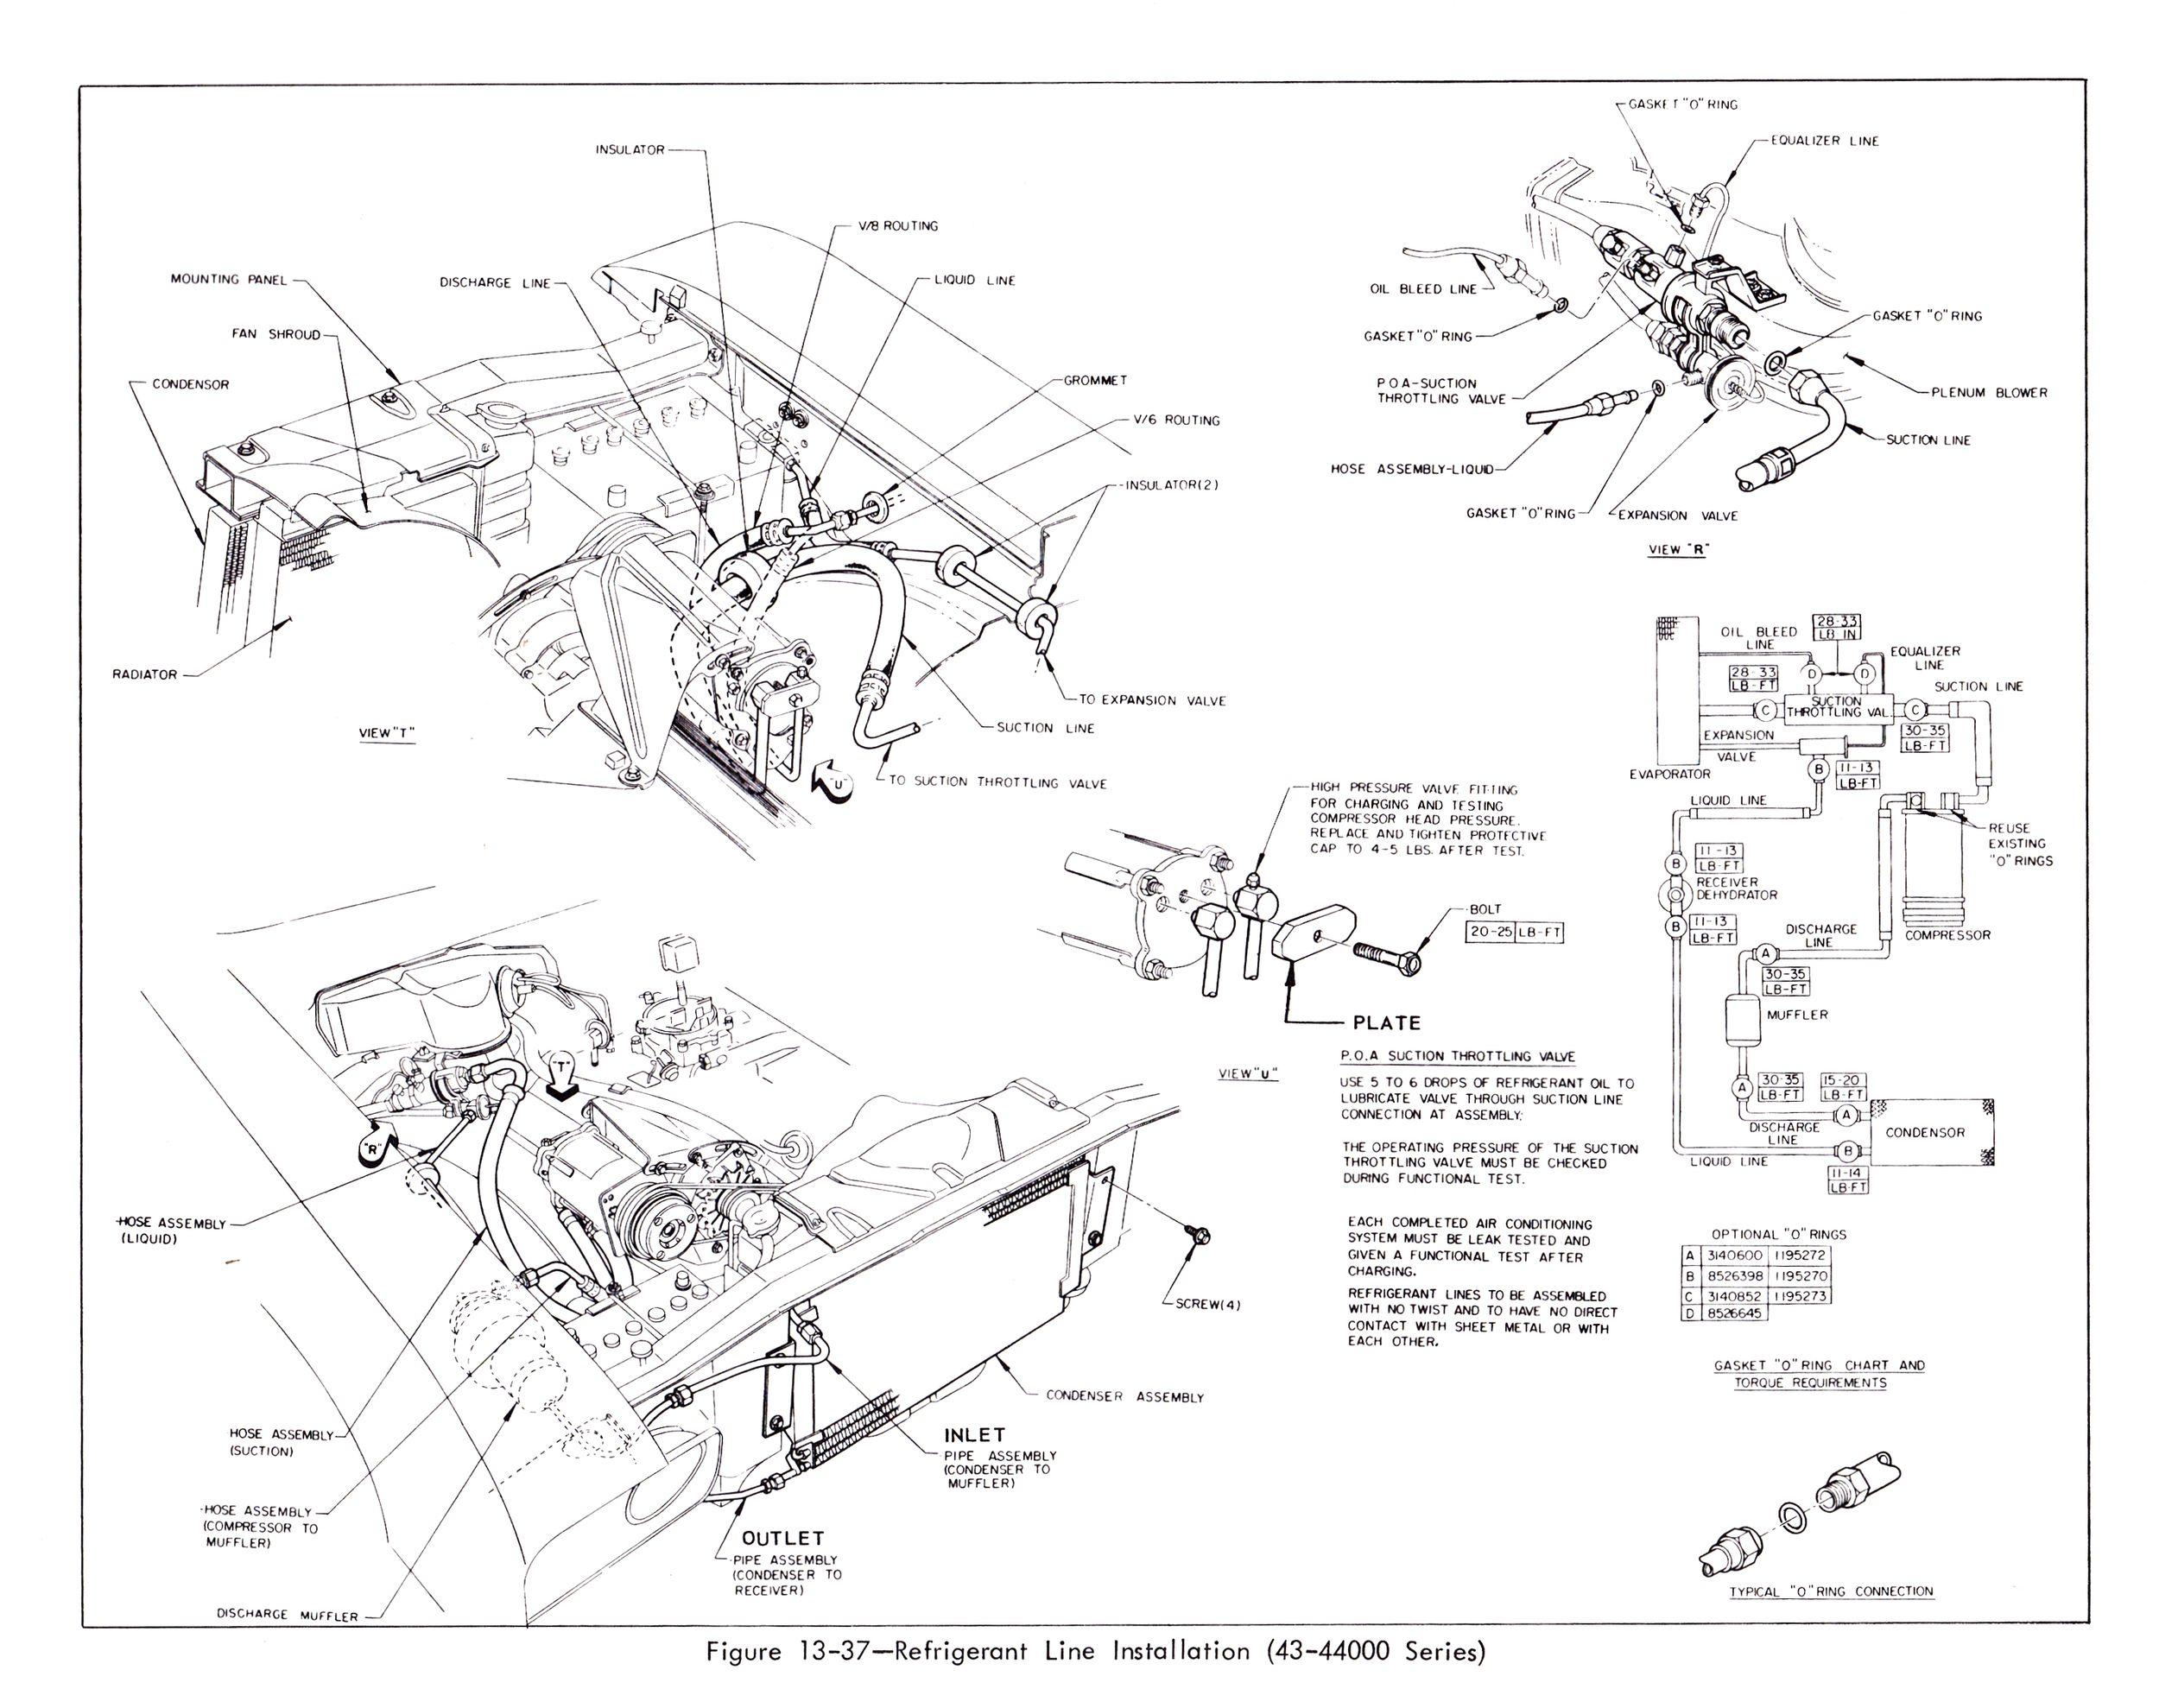 Sensational 1967 Impala Wiring Diagram Wiring Library Wiring Cloud Ymoonsalvmohammedshrineorg